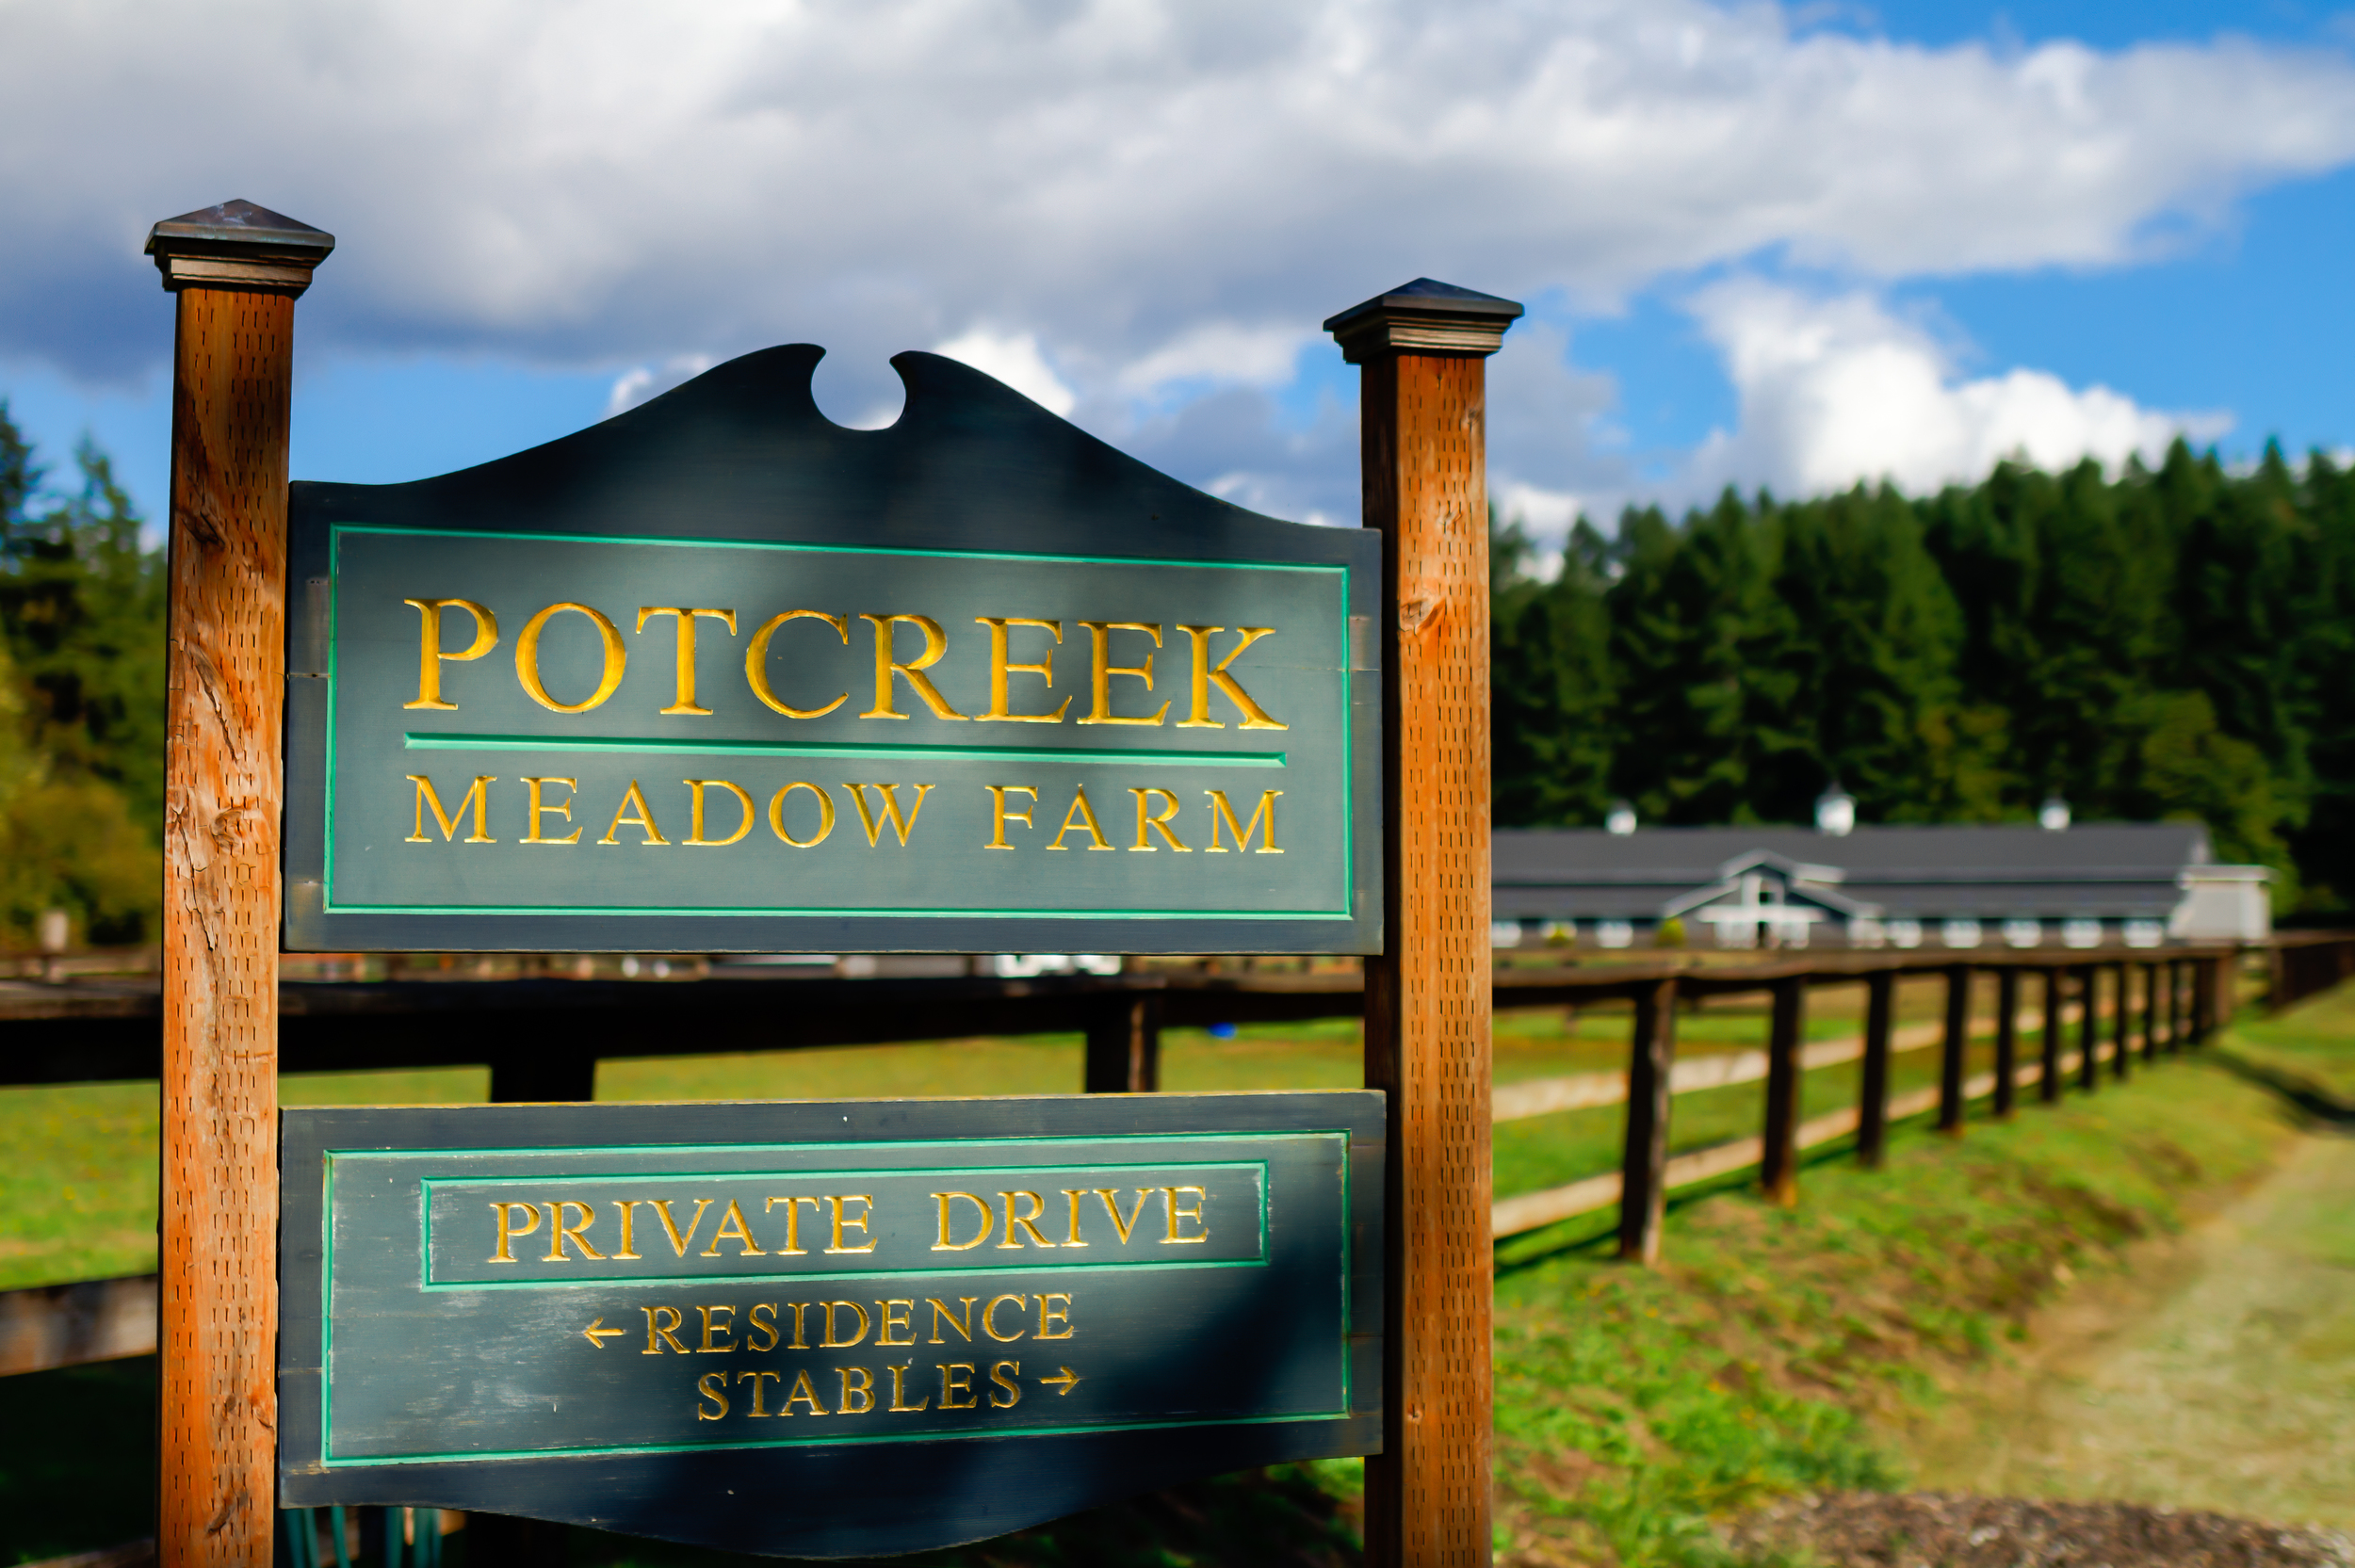 Located on 20 pristine acres in Redmond, Washington